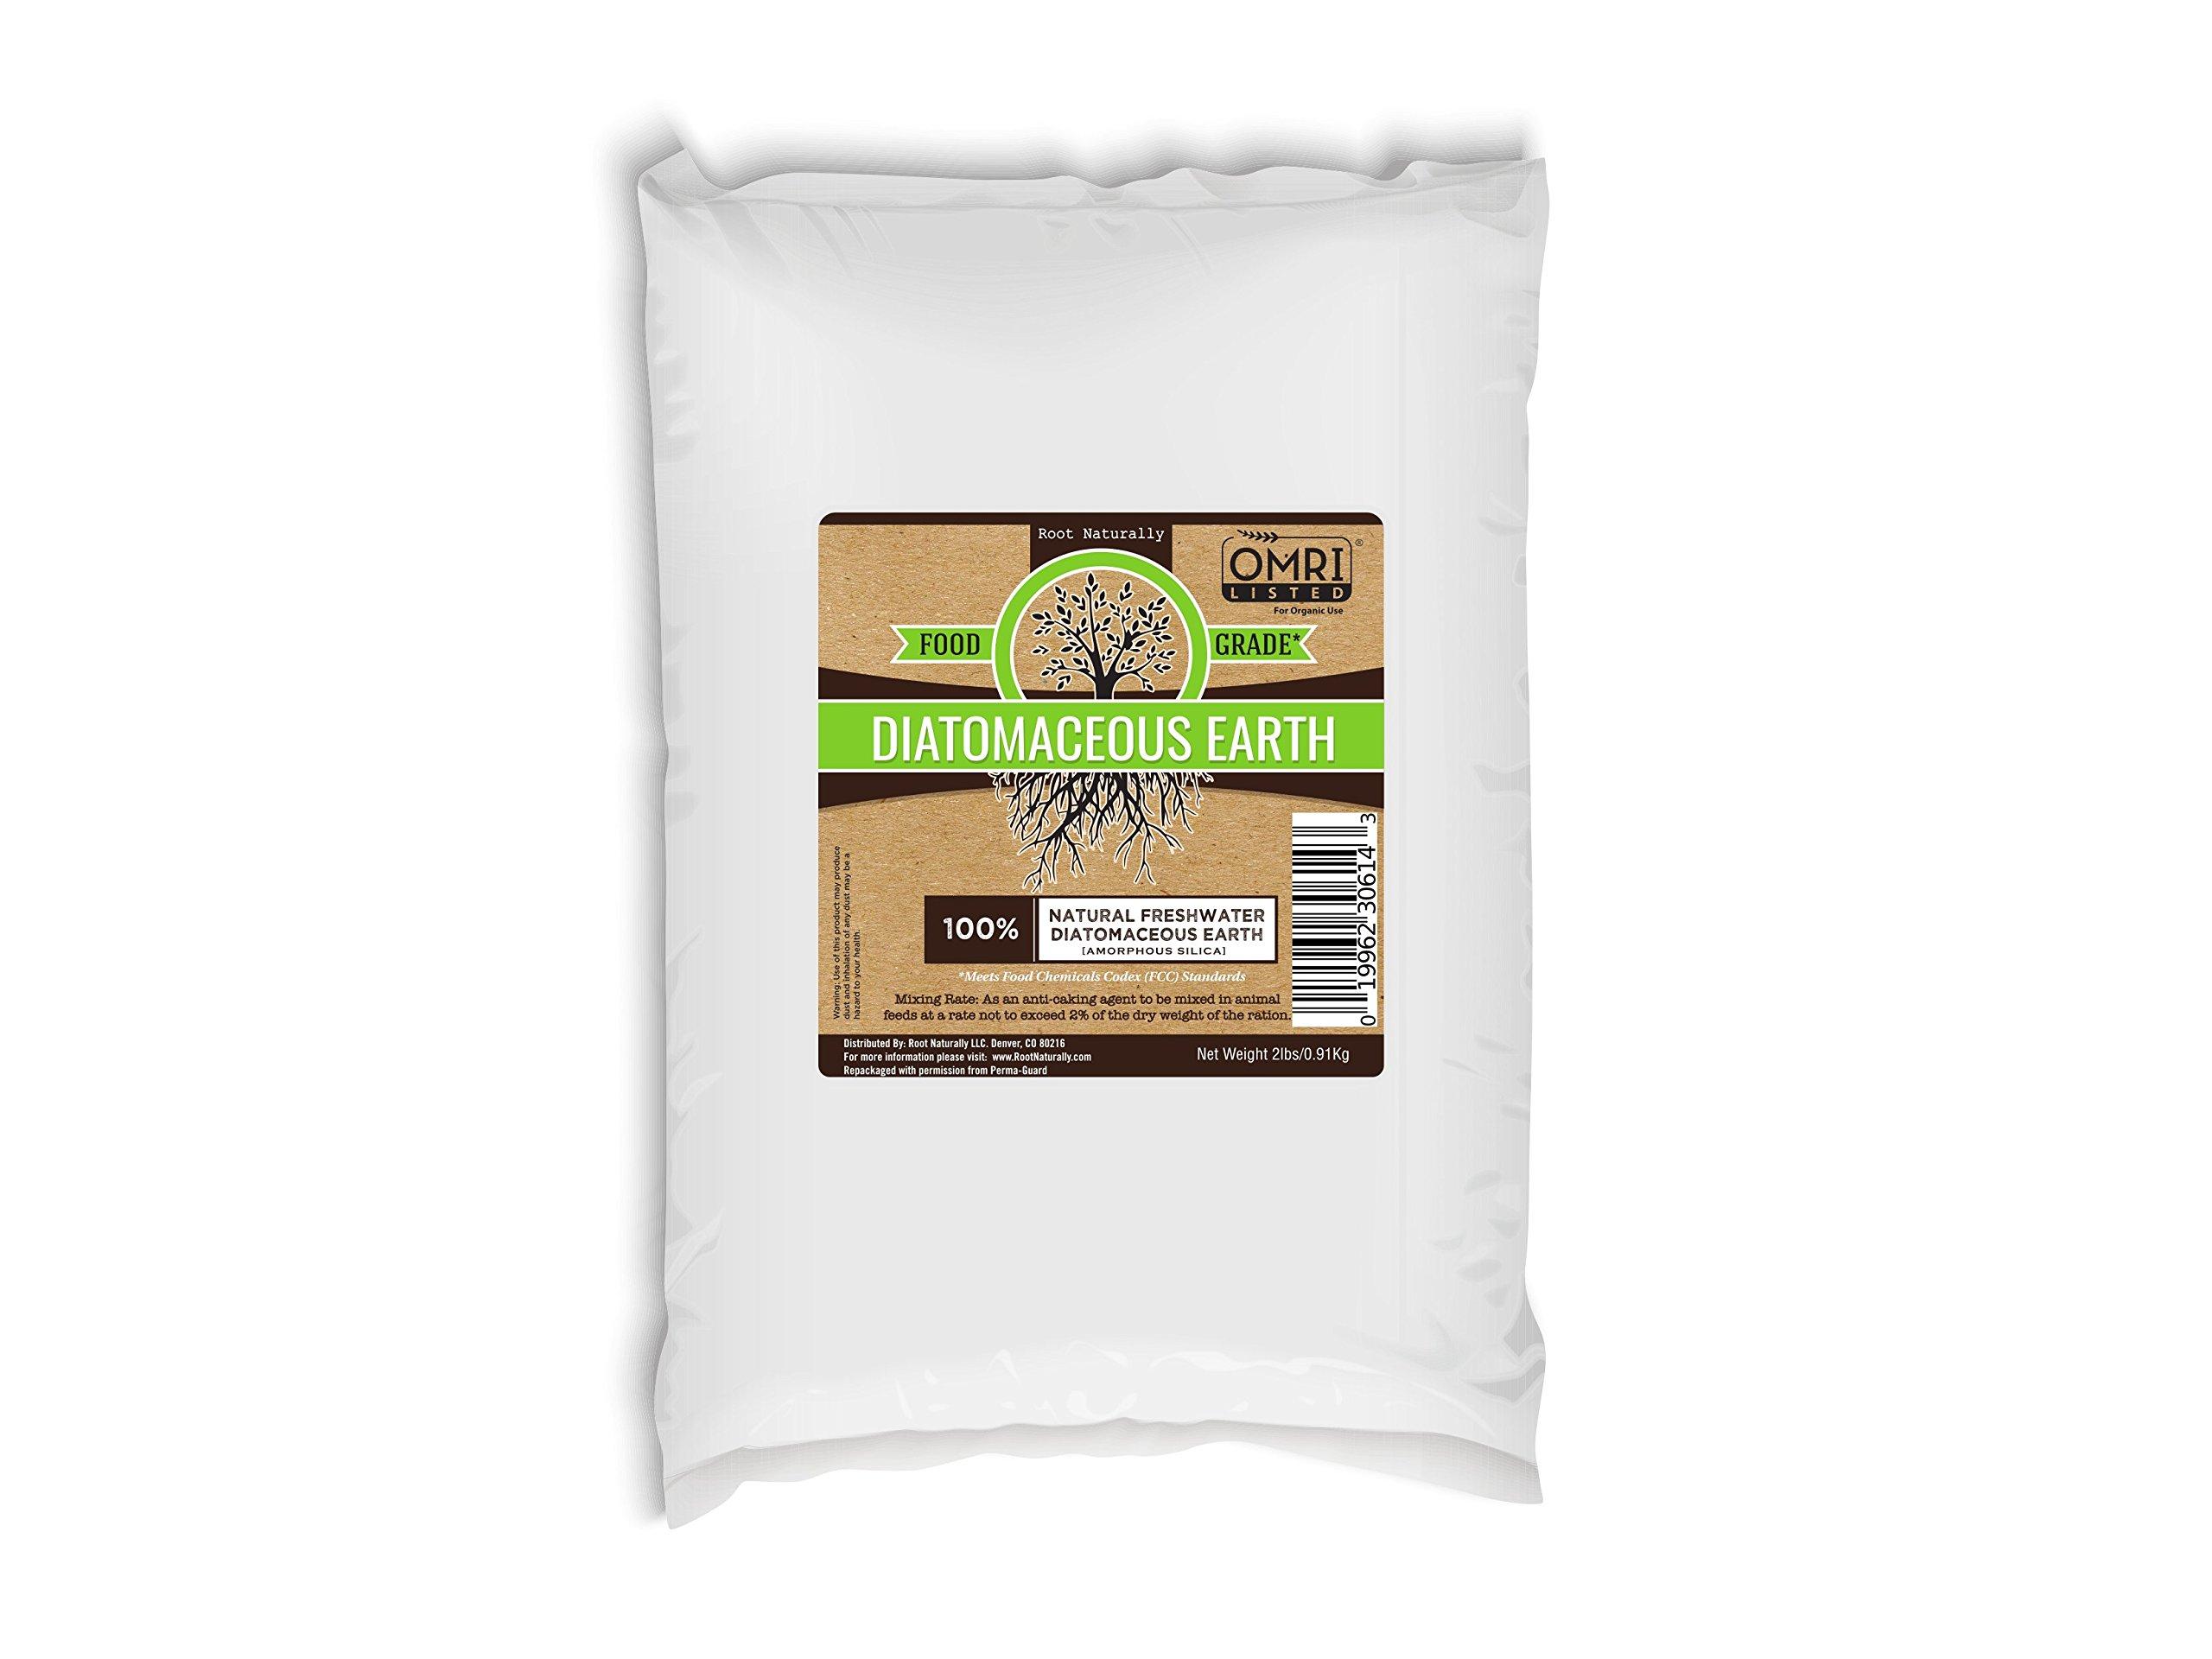 Root Naturally Food Grade Diatomaceous Earth